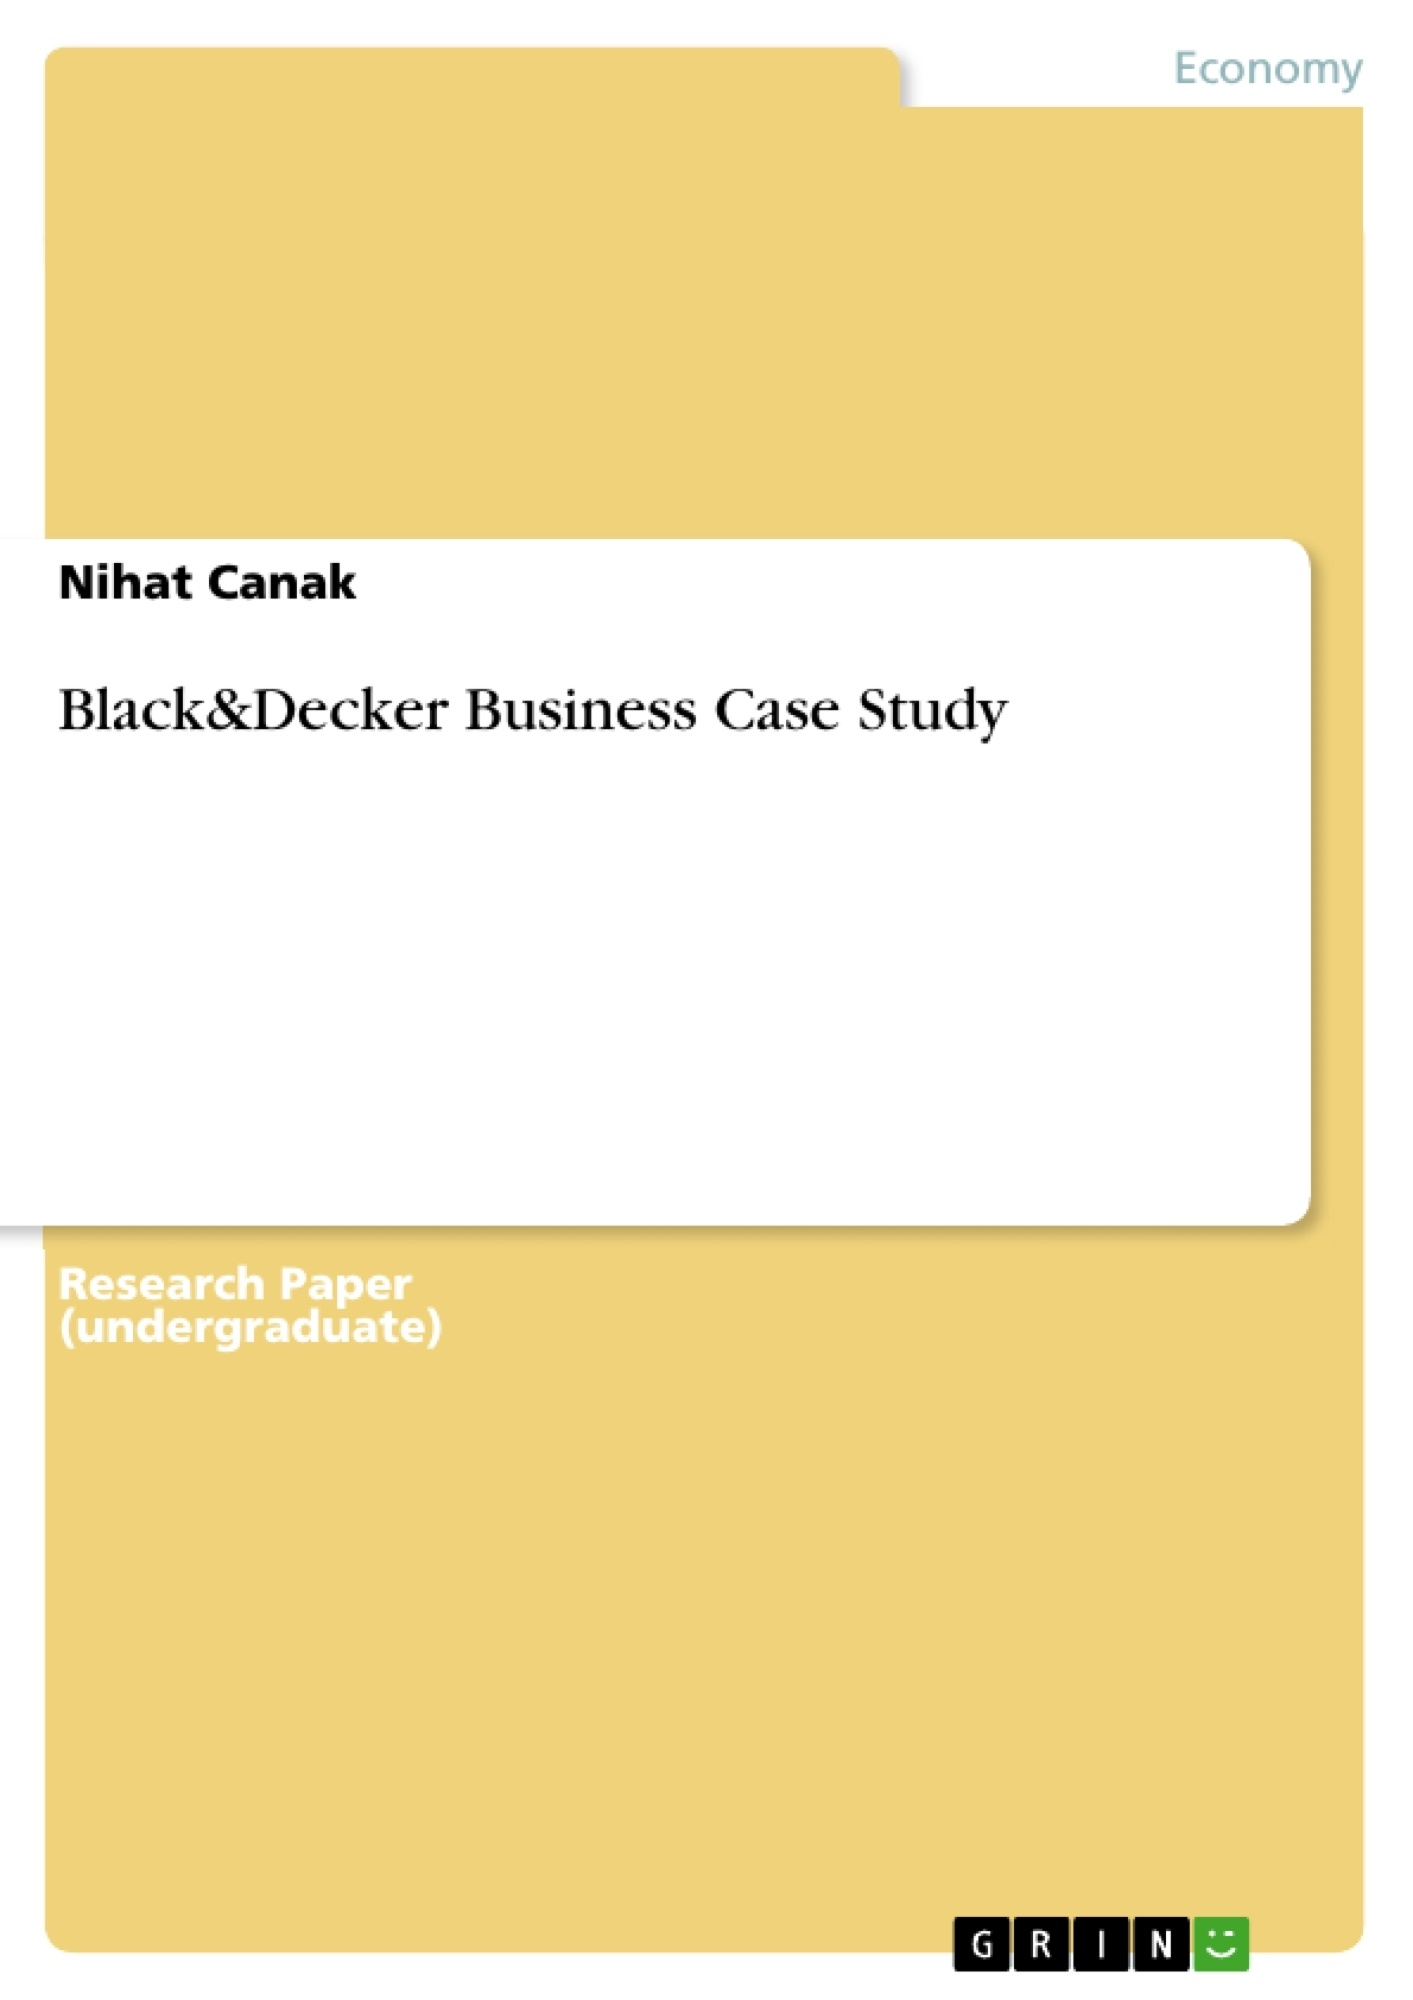 Title: Black&Decker Business Case Study